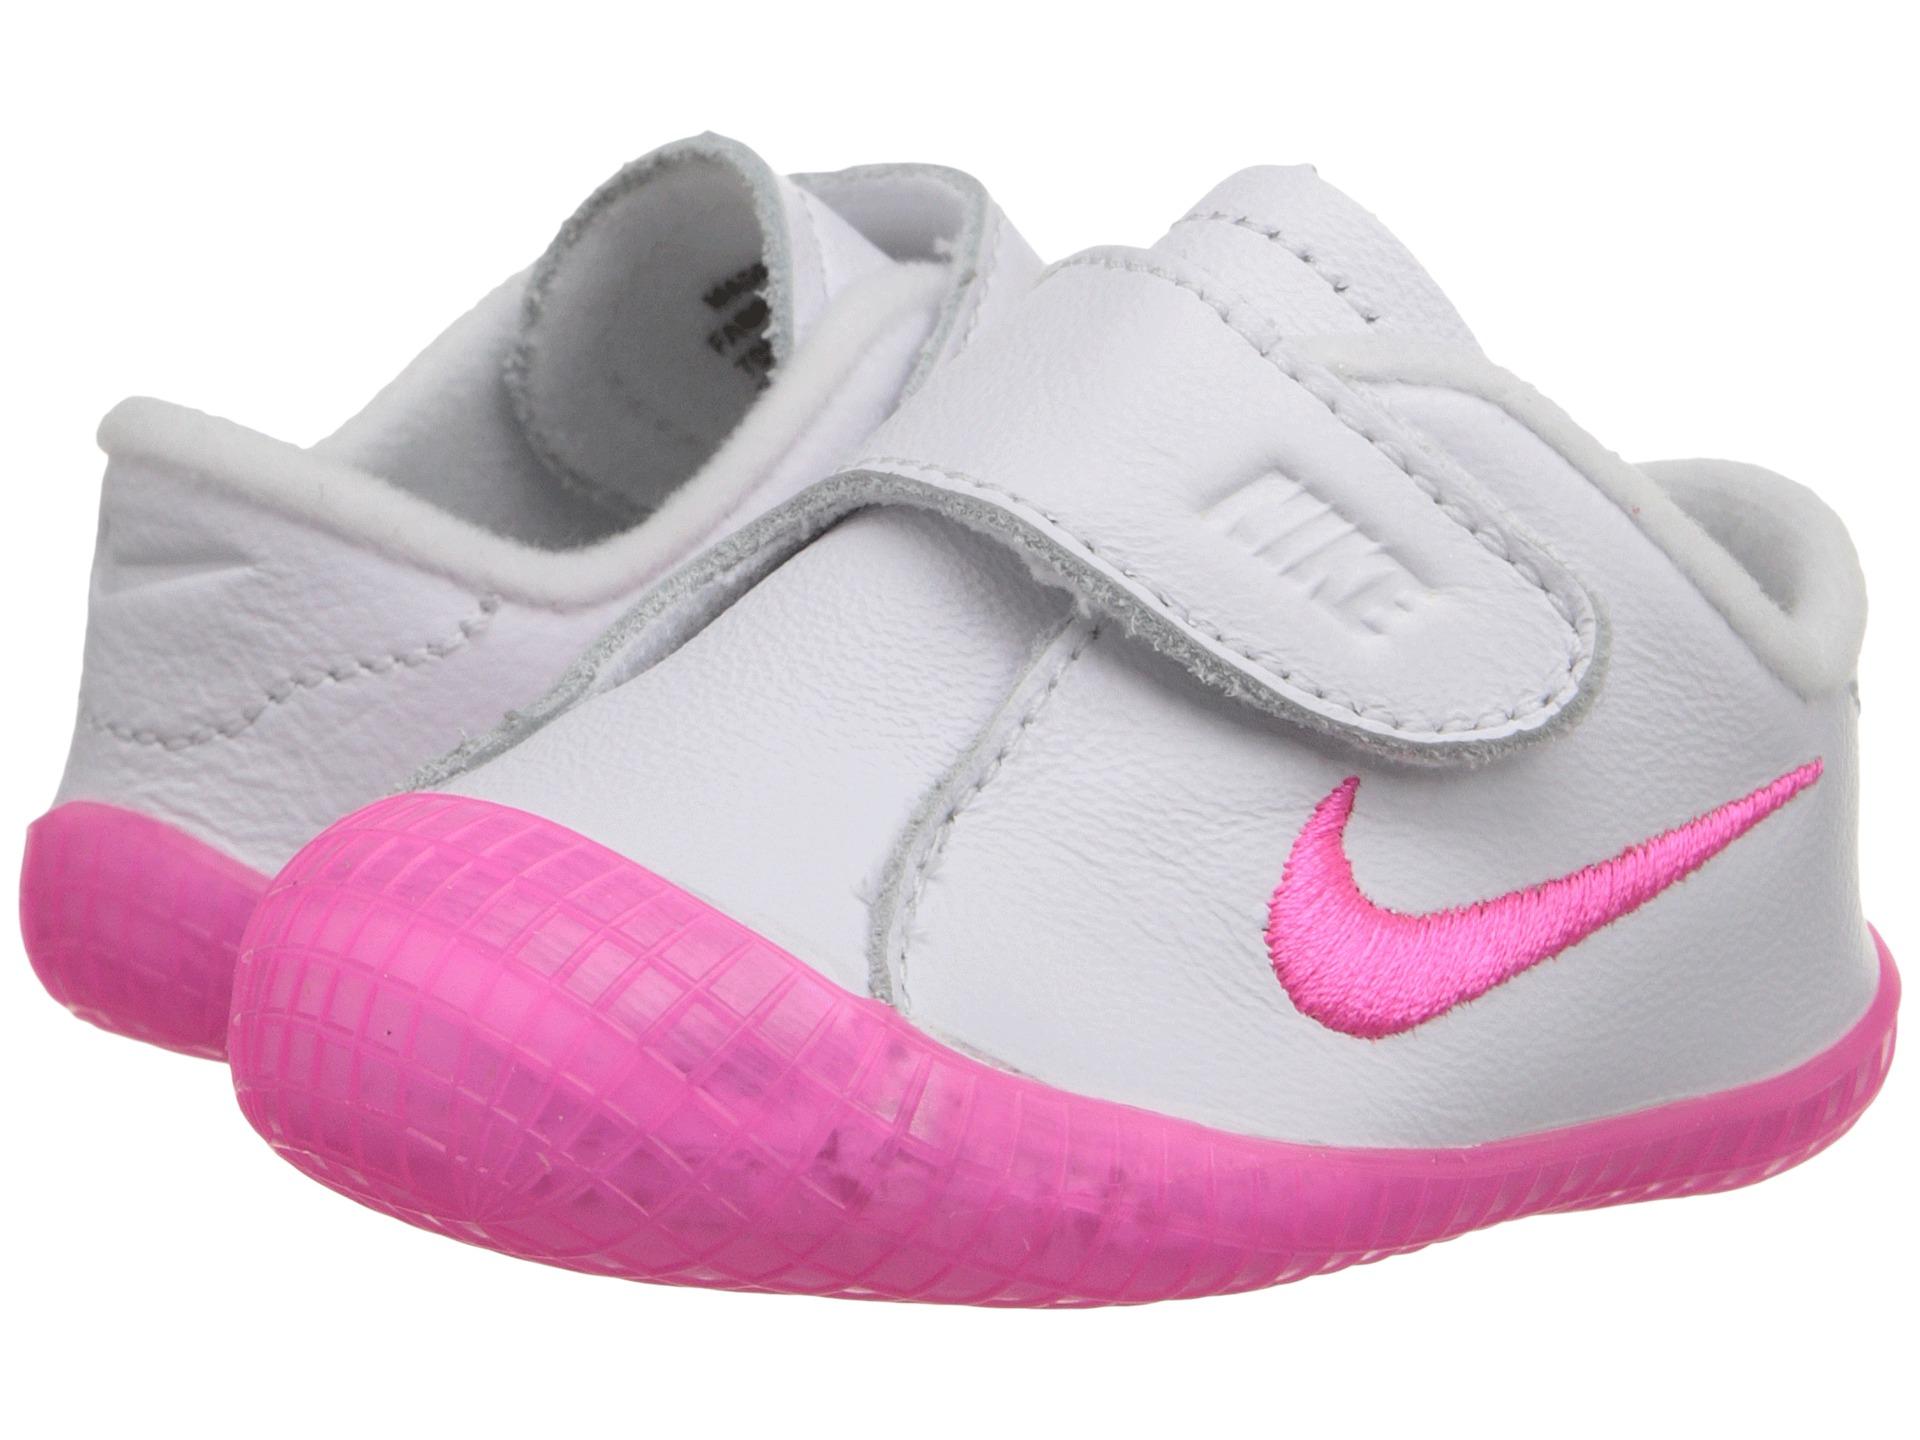 sports shoes 65b3c b9107 Nike Free Waffle Ac Leather Shoes Womens   Quandary